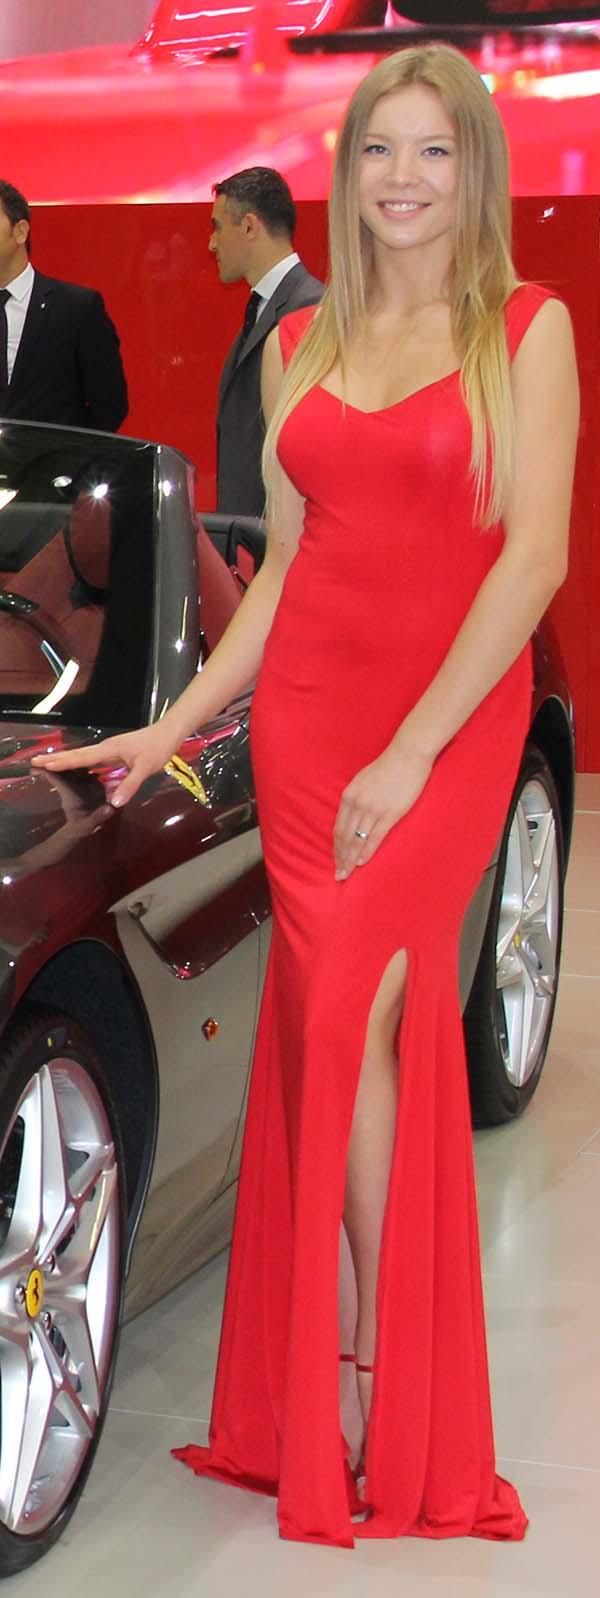 istanbul autoshow 2015 mankenler 14